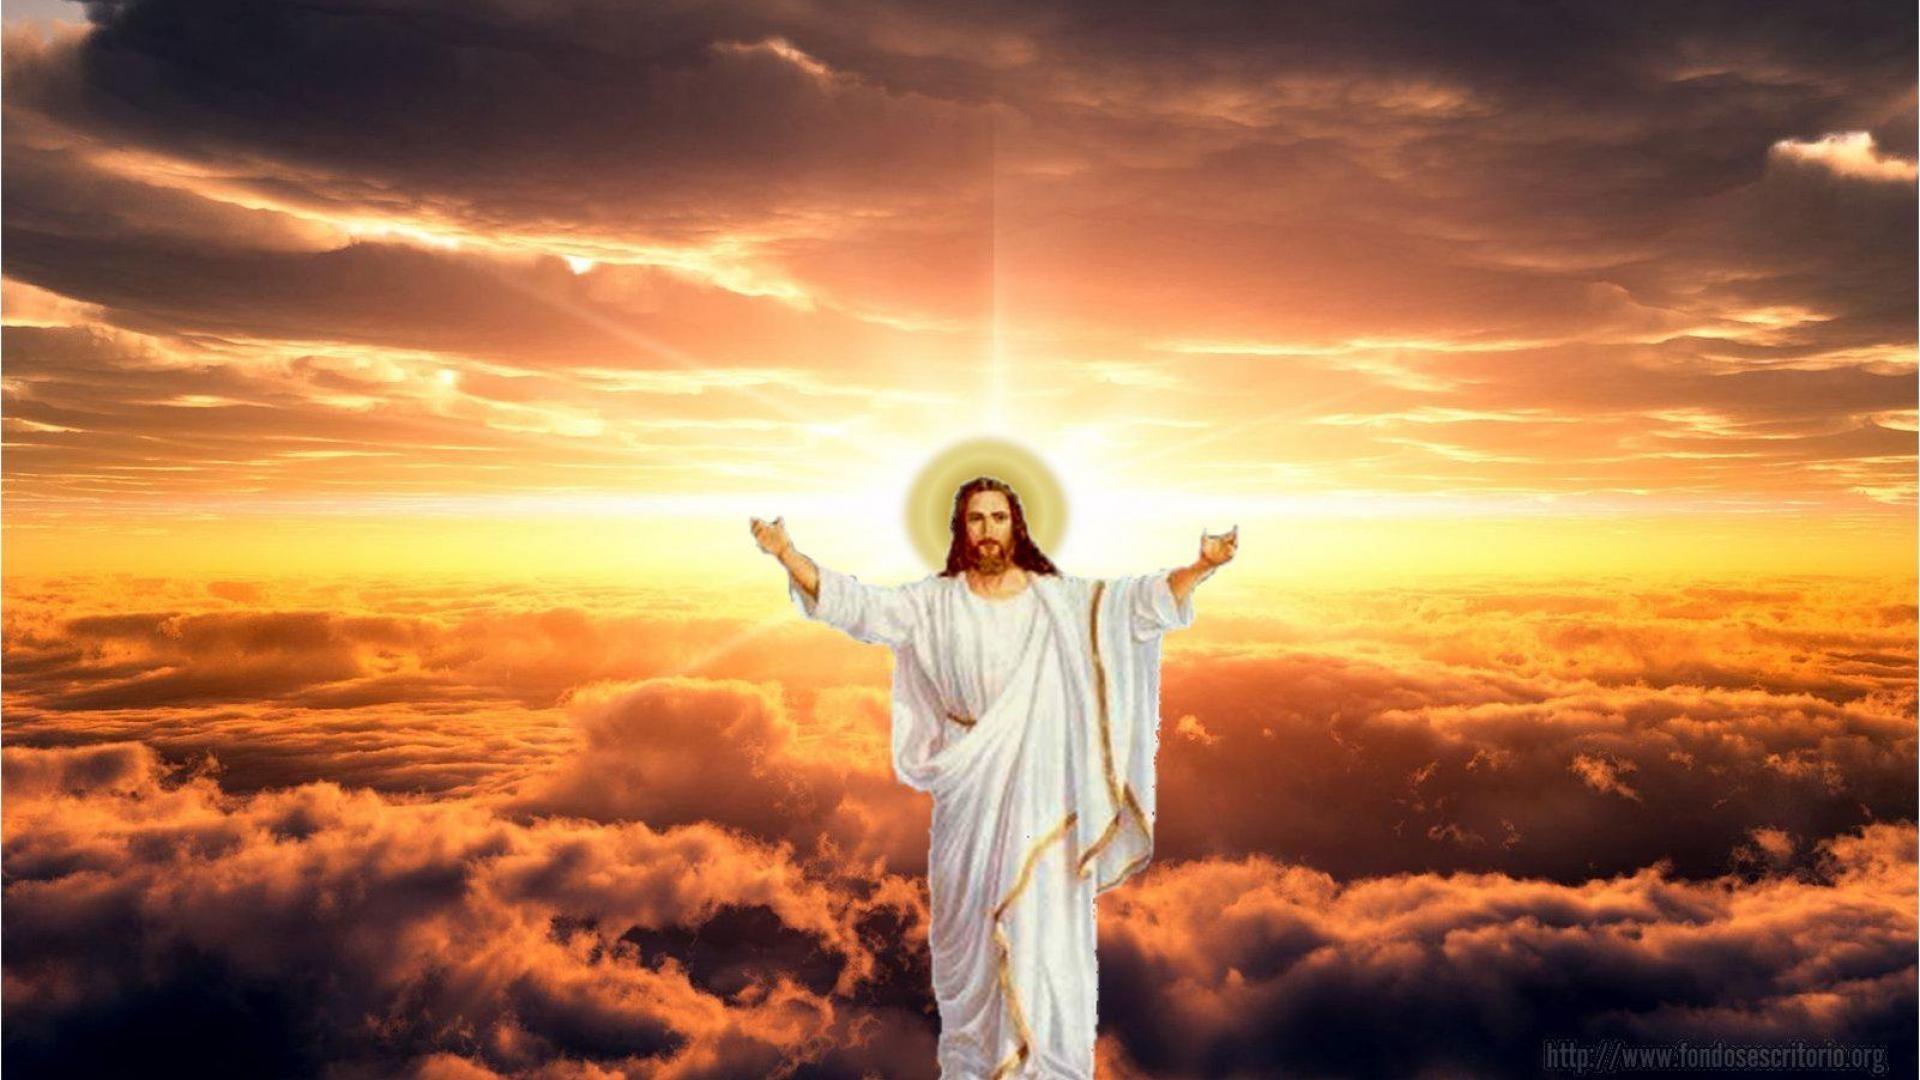 chua jesus 19